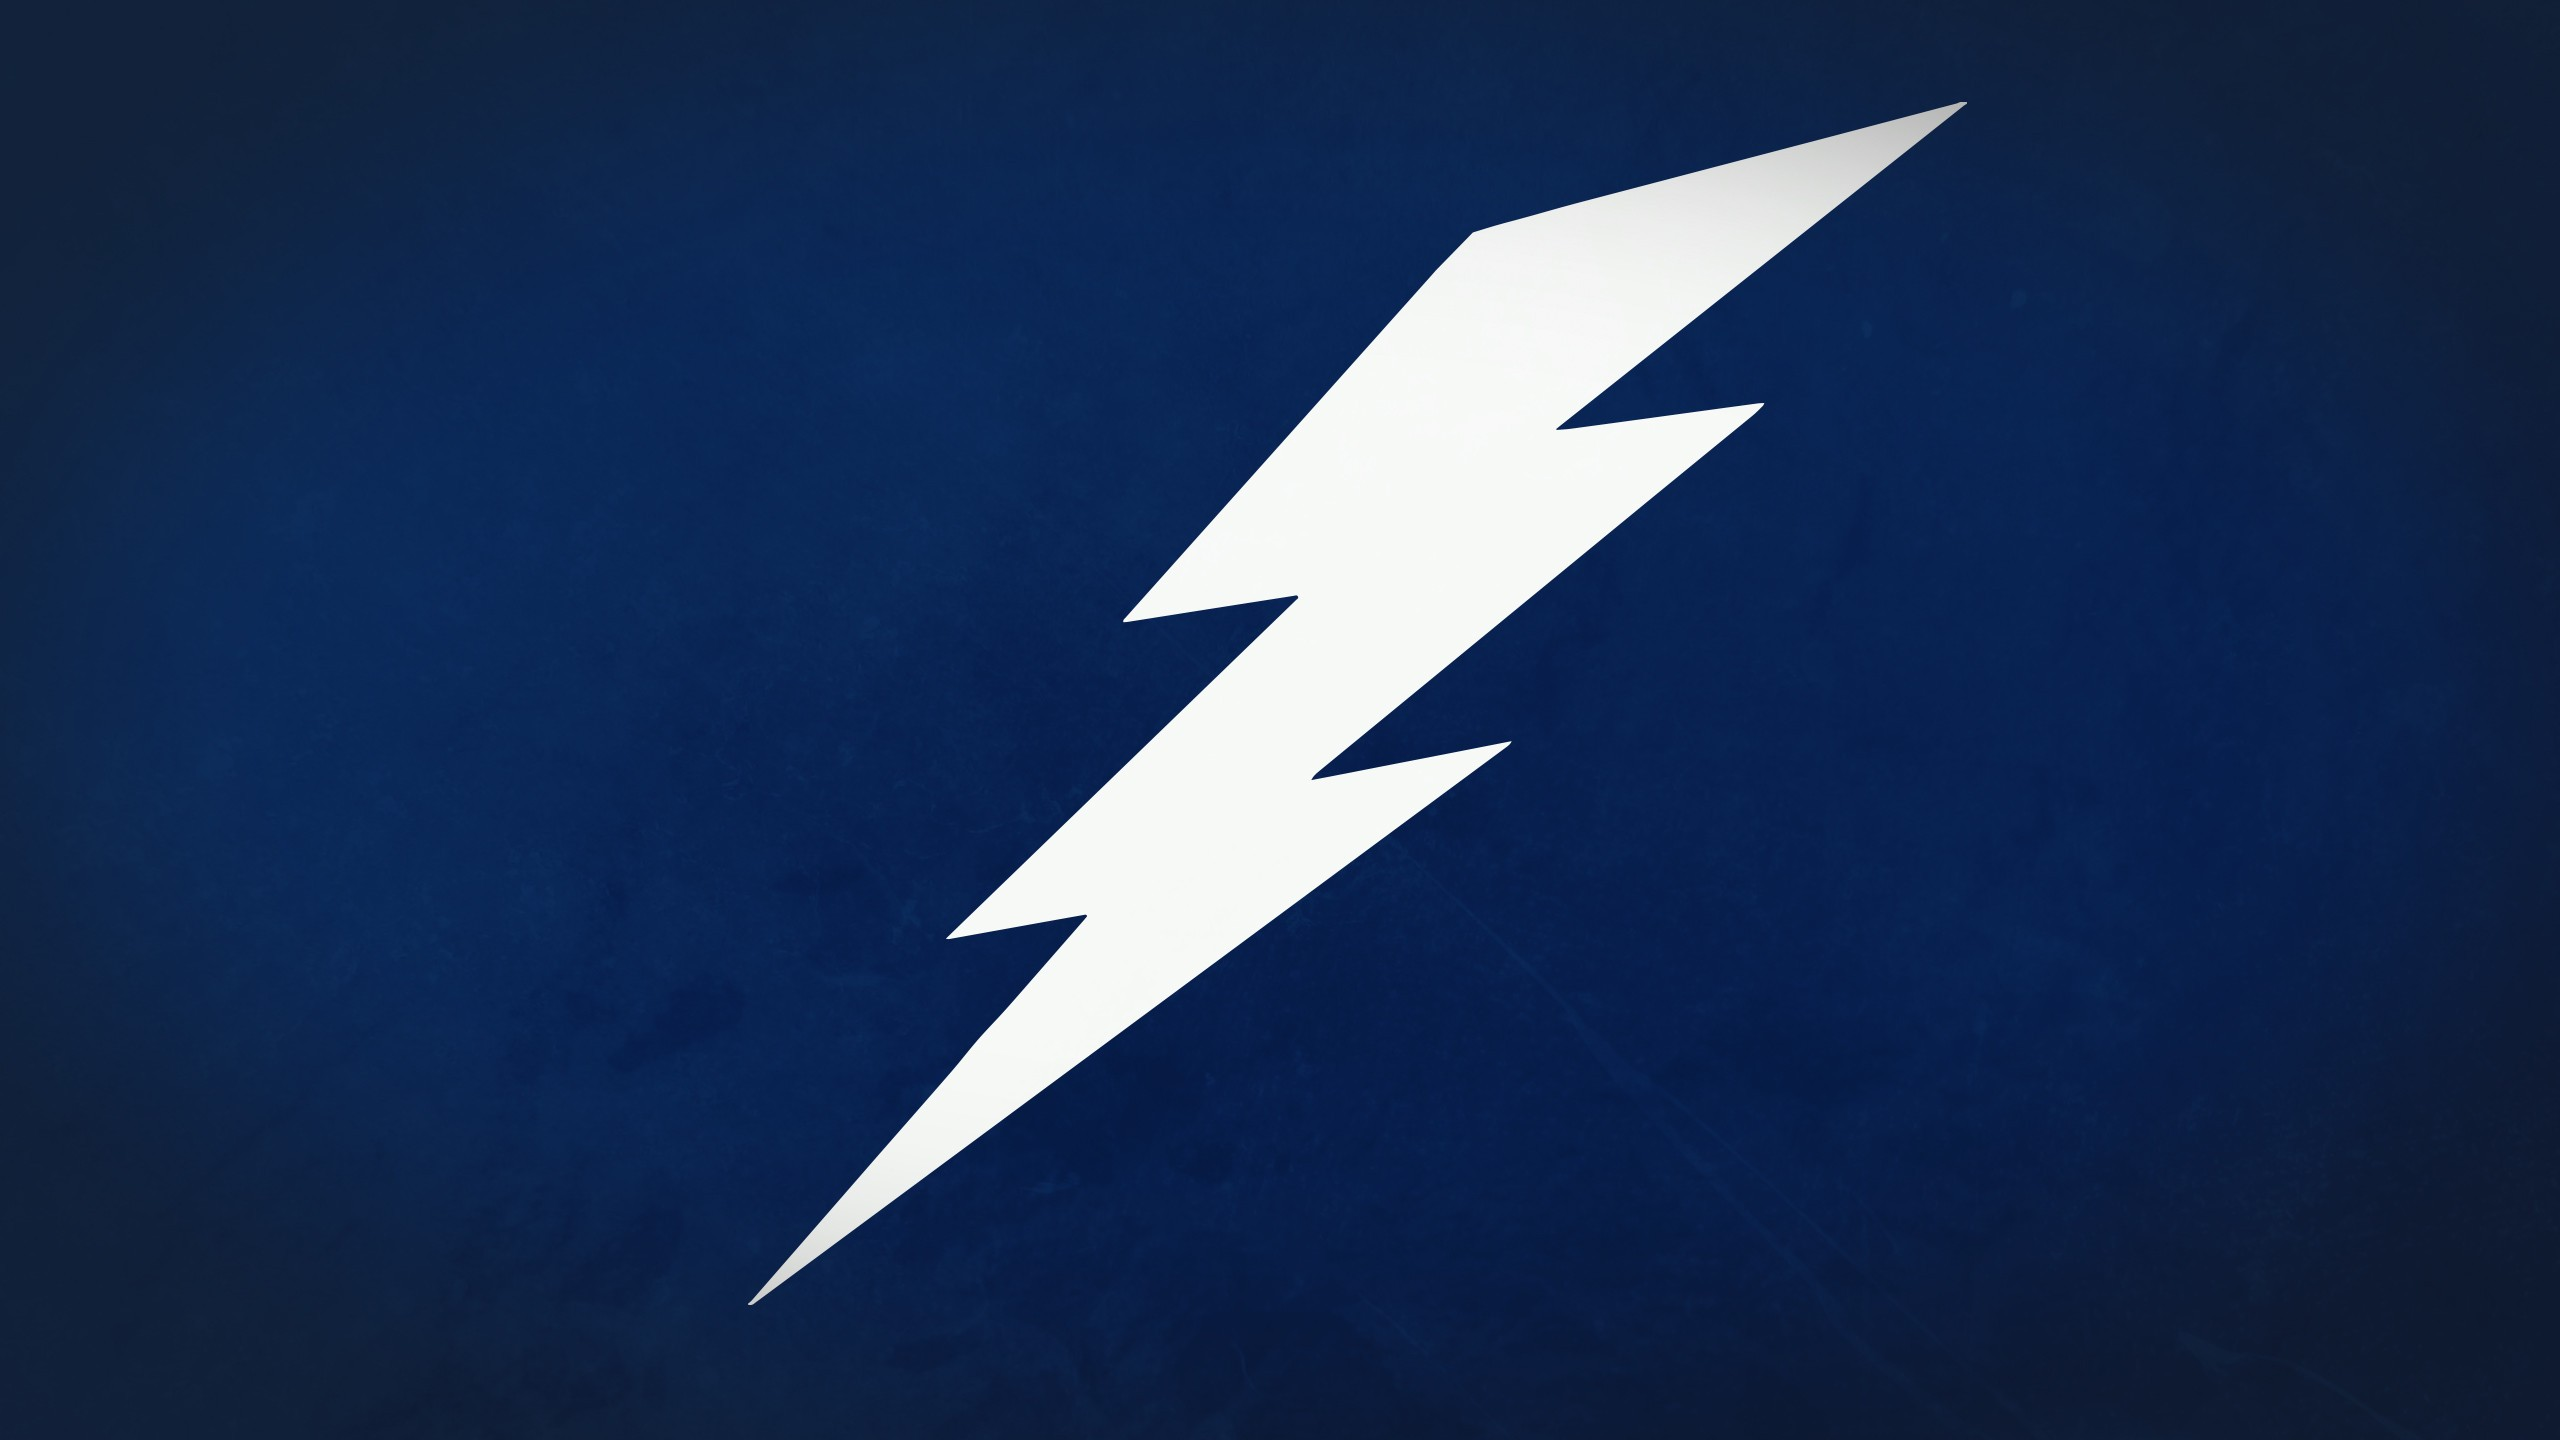 Tampa Bay Lightning Computer Wallpapers Desktop Backgrounds 2560x1440